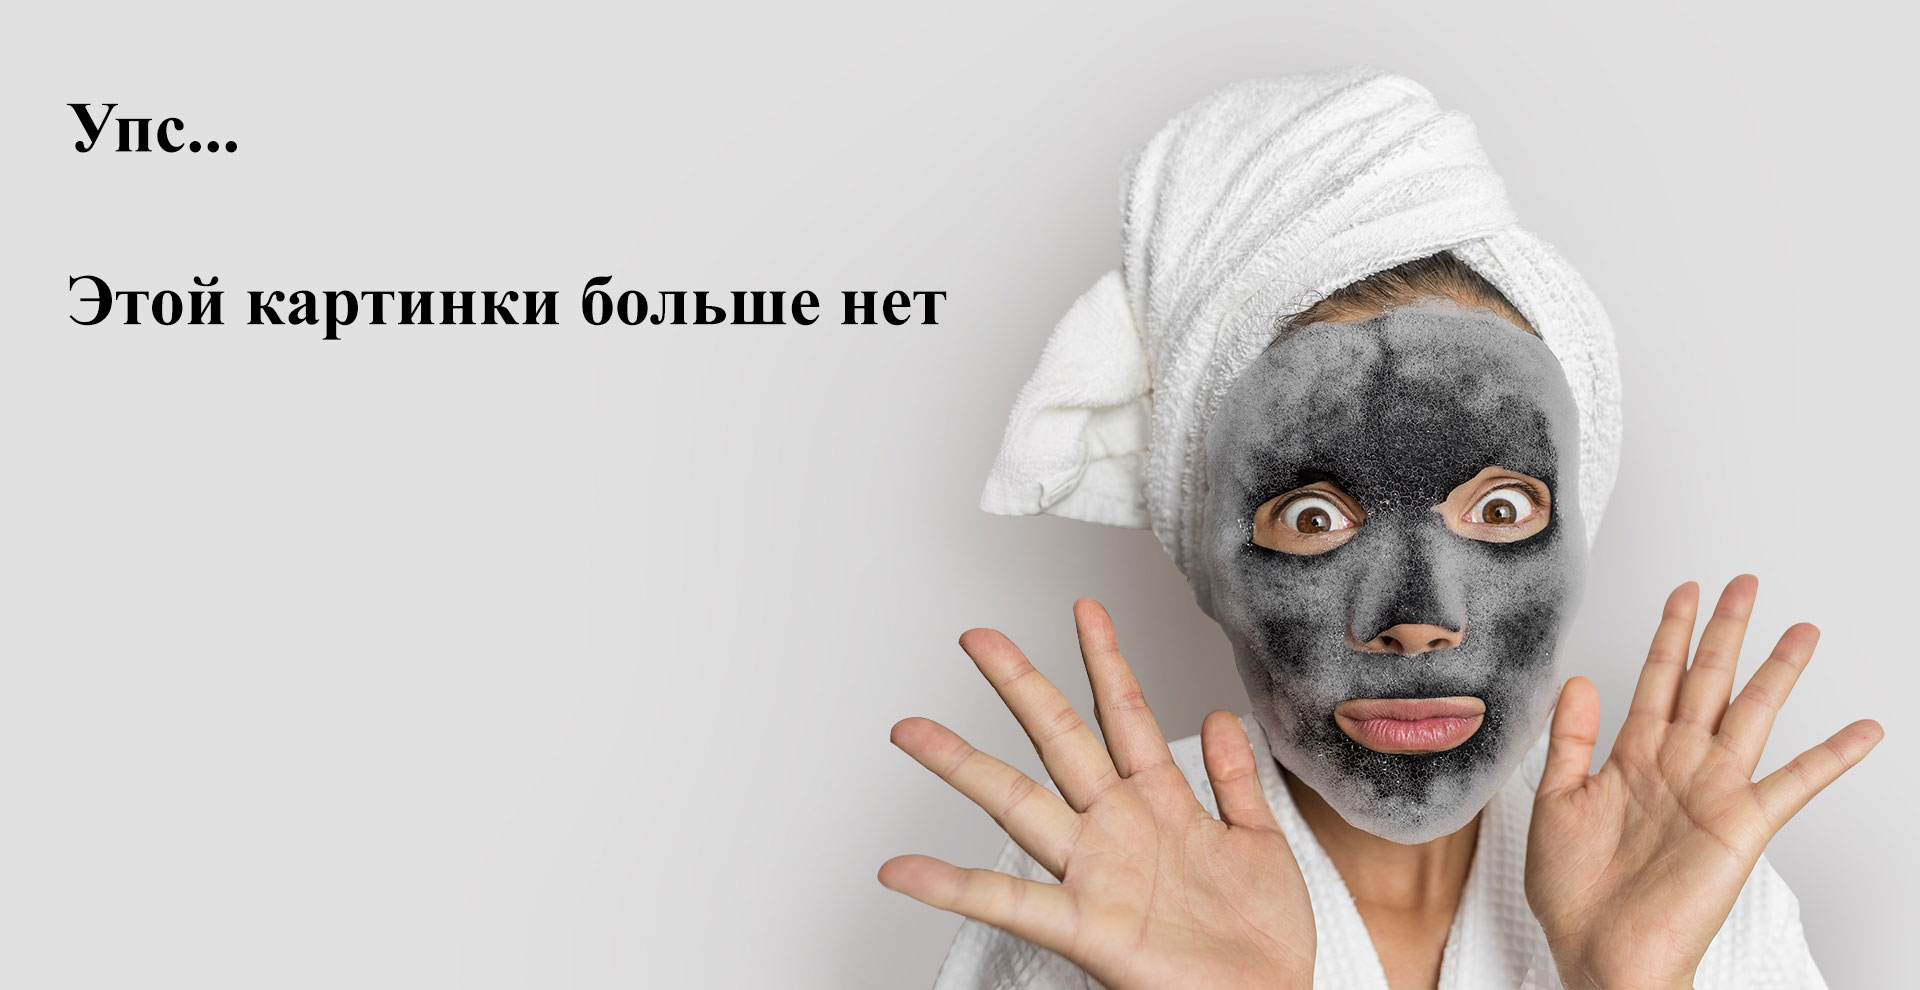 Patrisa Nail, Гель-лак Московская сага №757